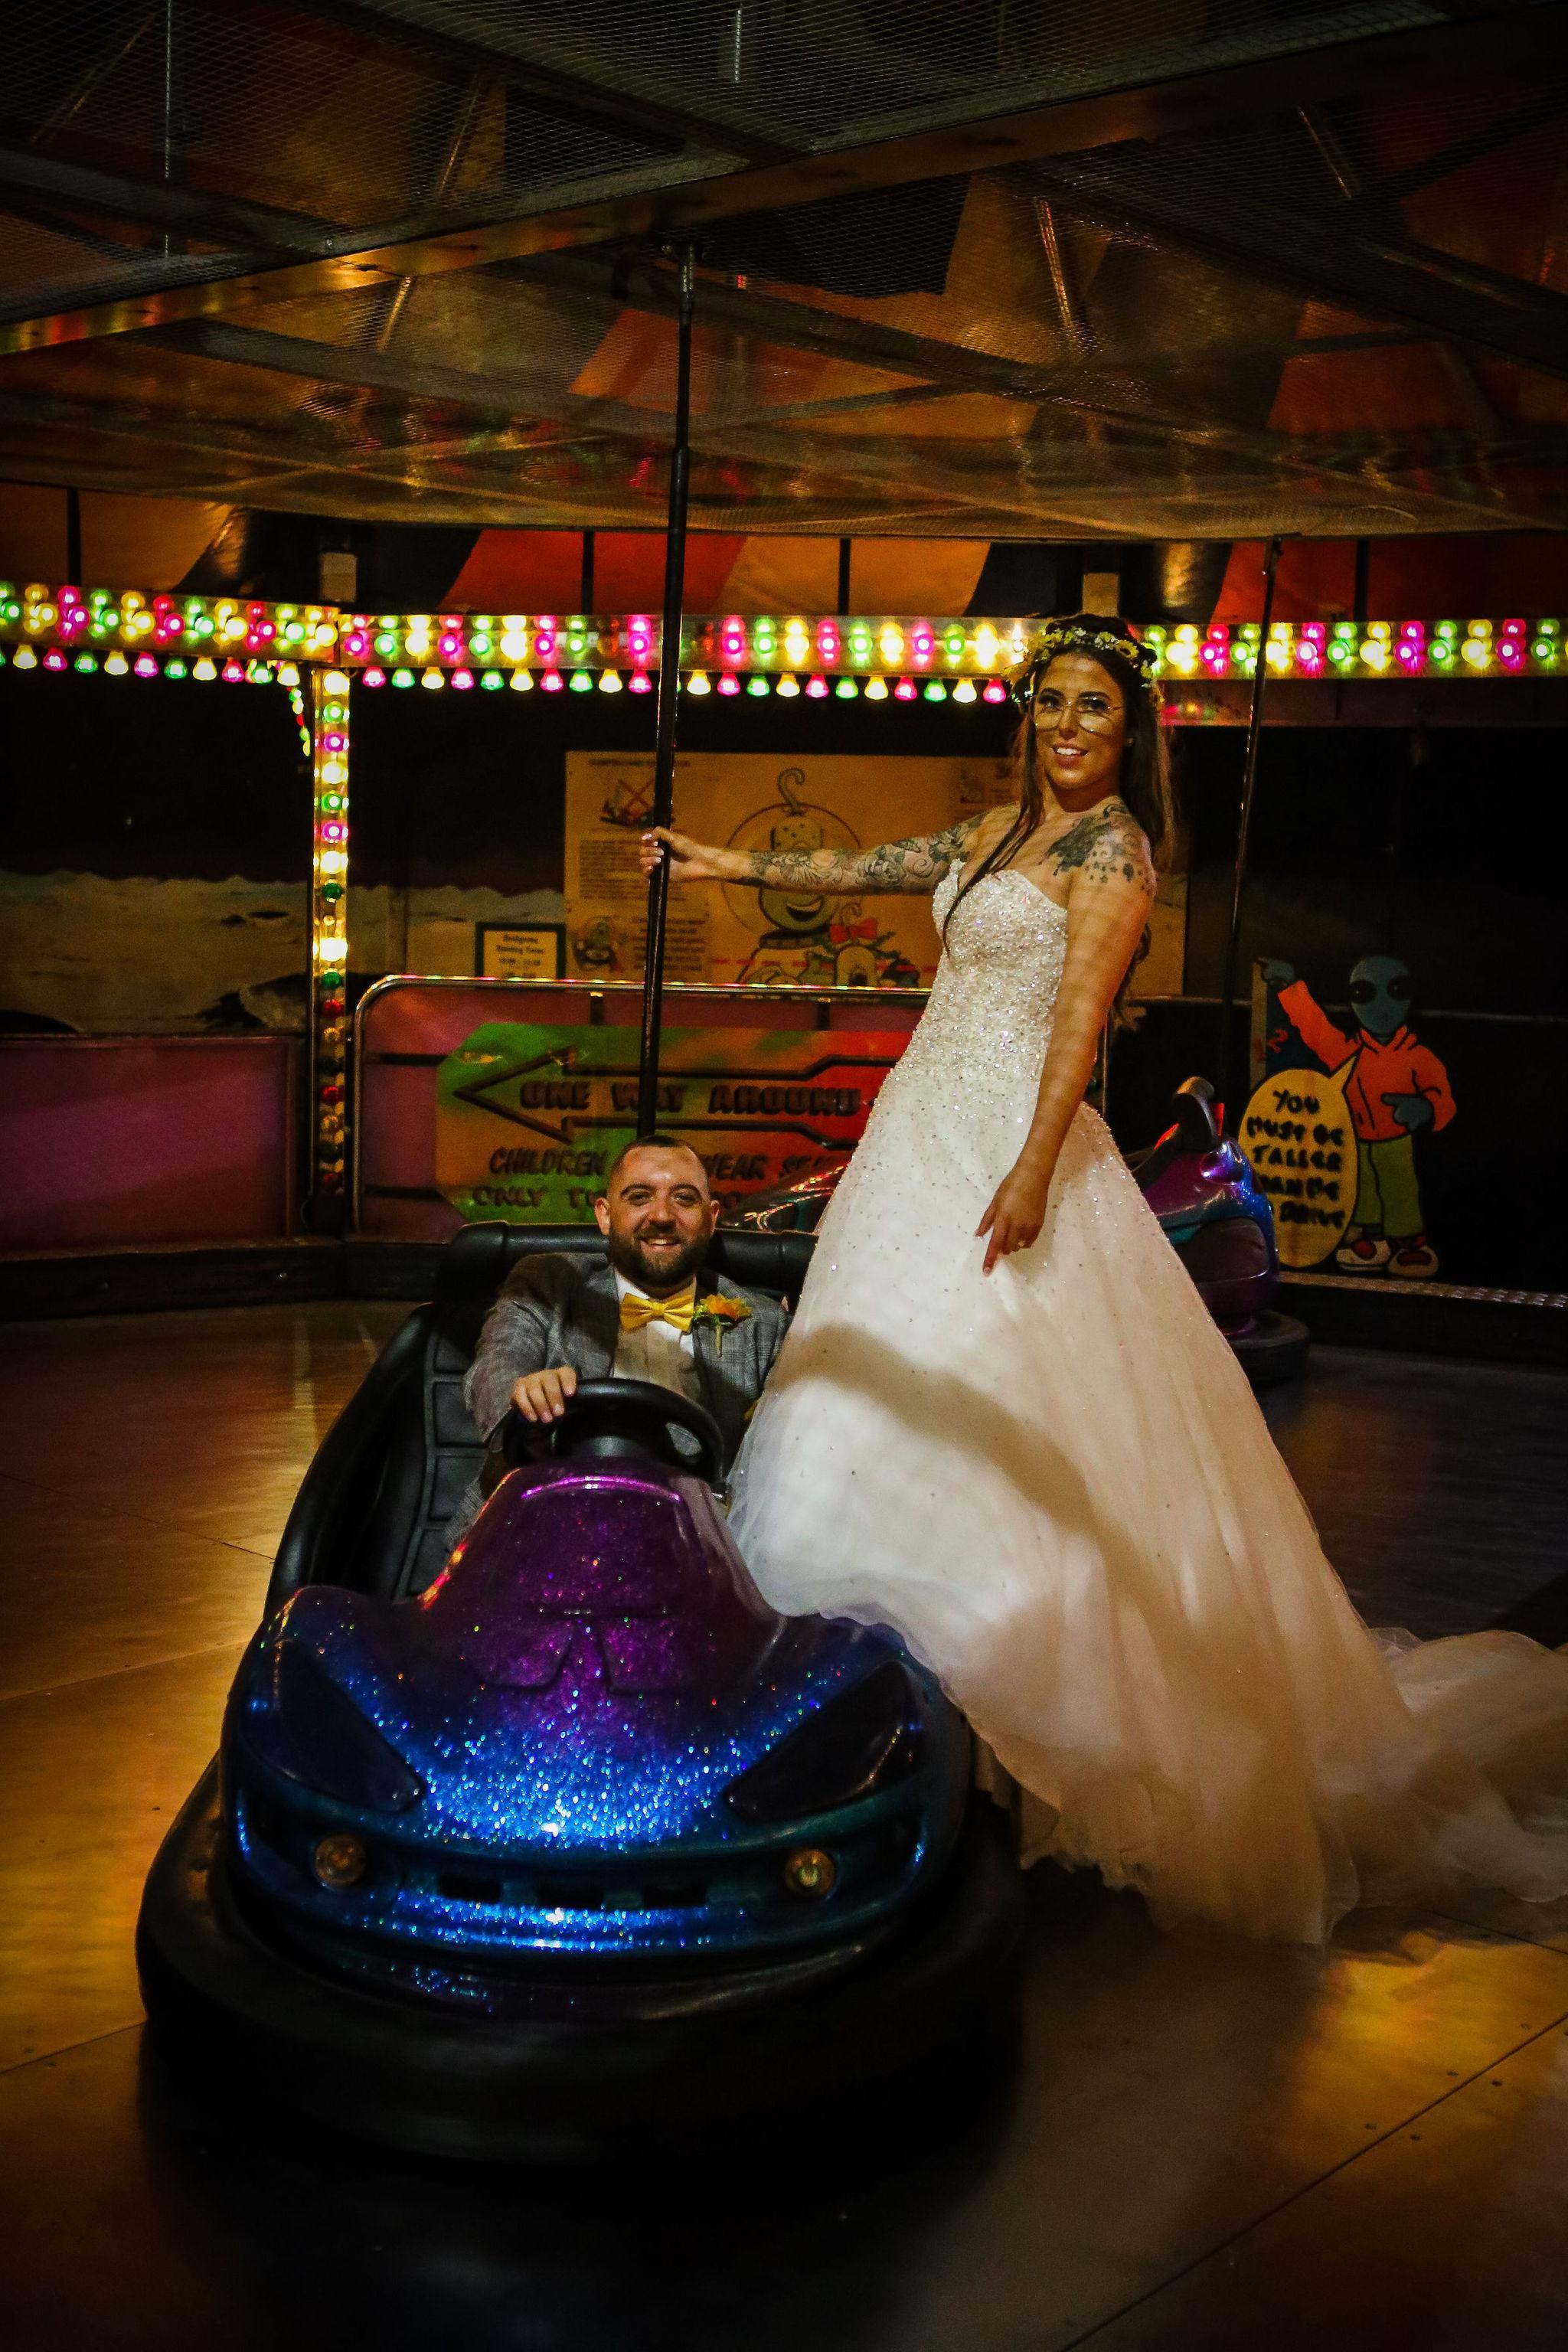 Harriet&Rhys Wedding - quirky wedding with dodgems - funfair at a wedding